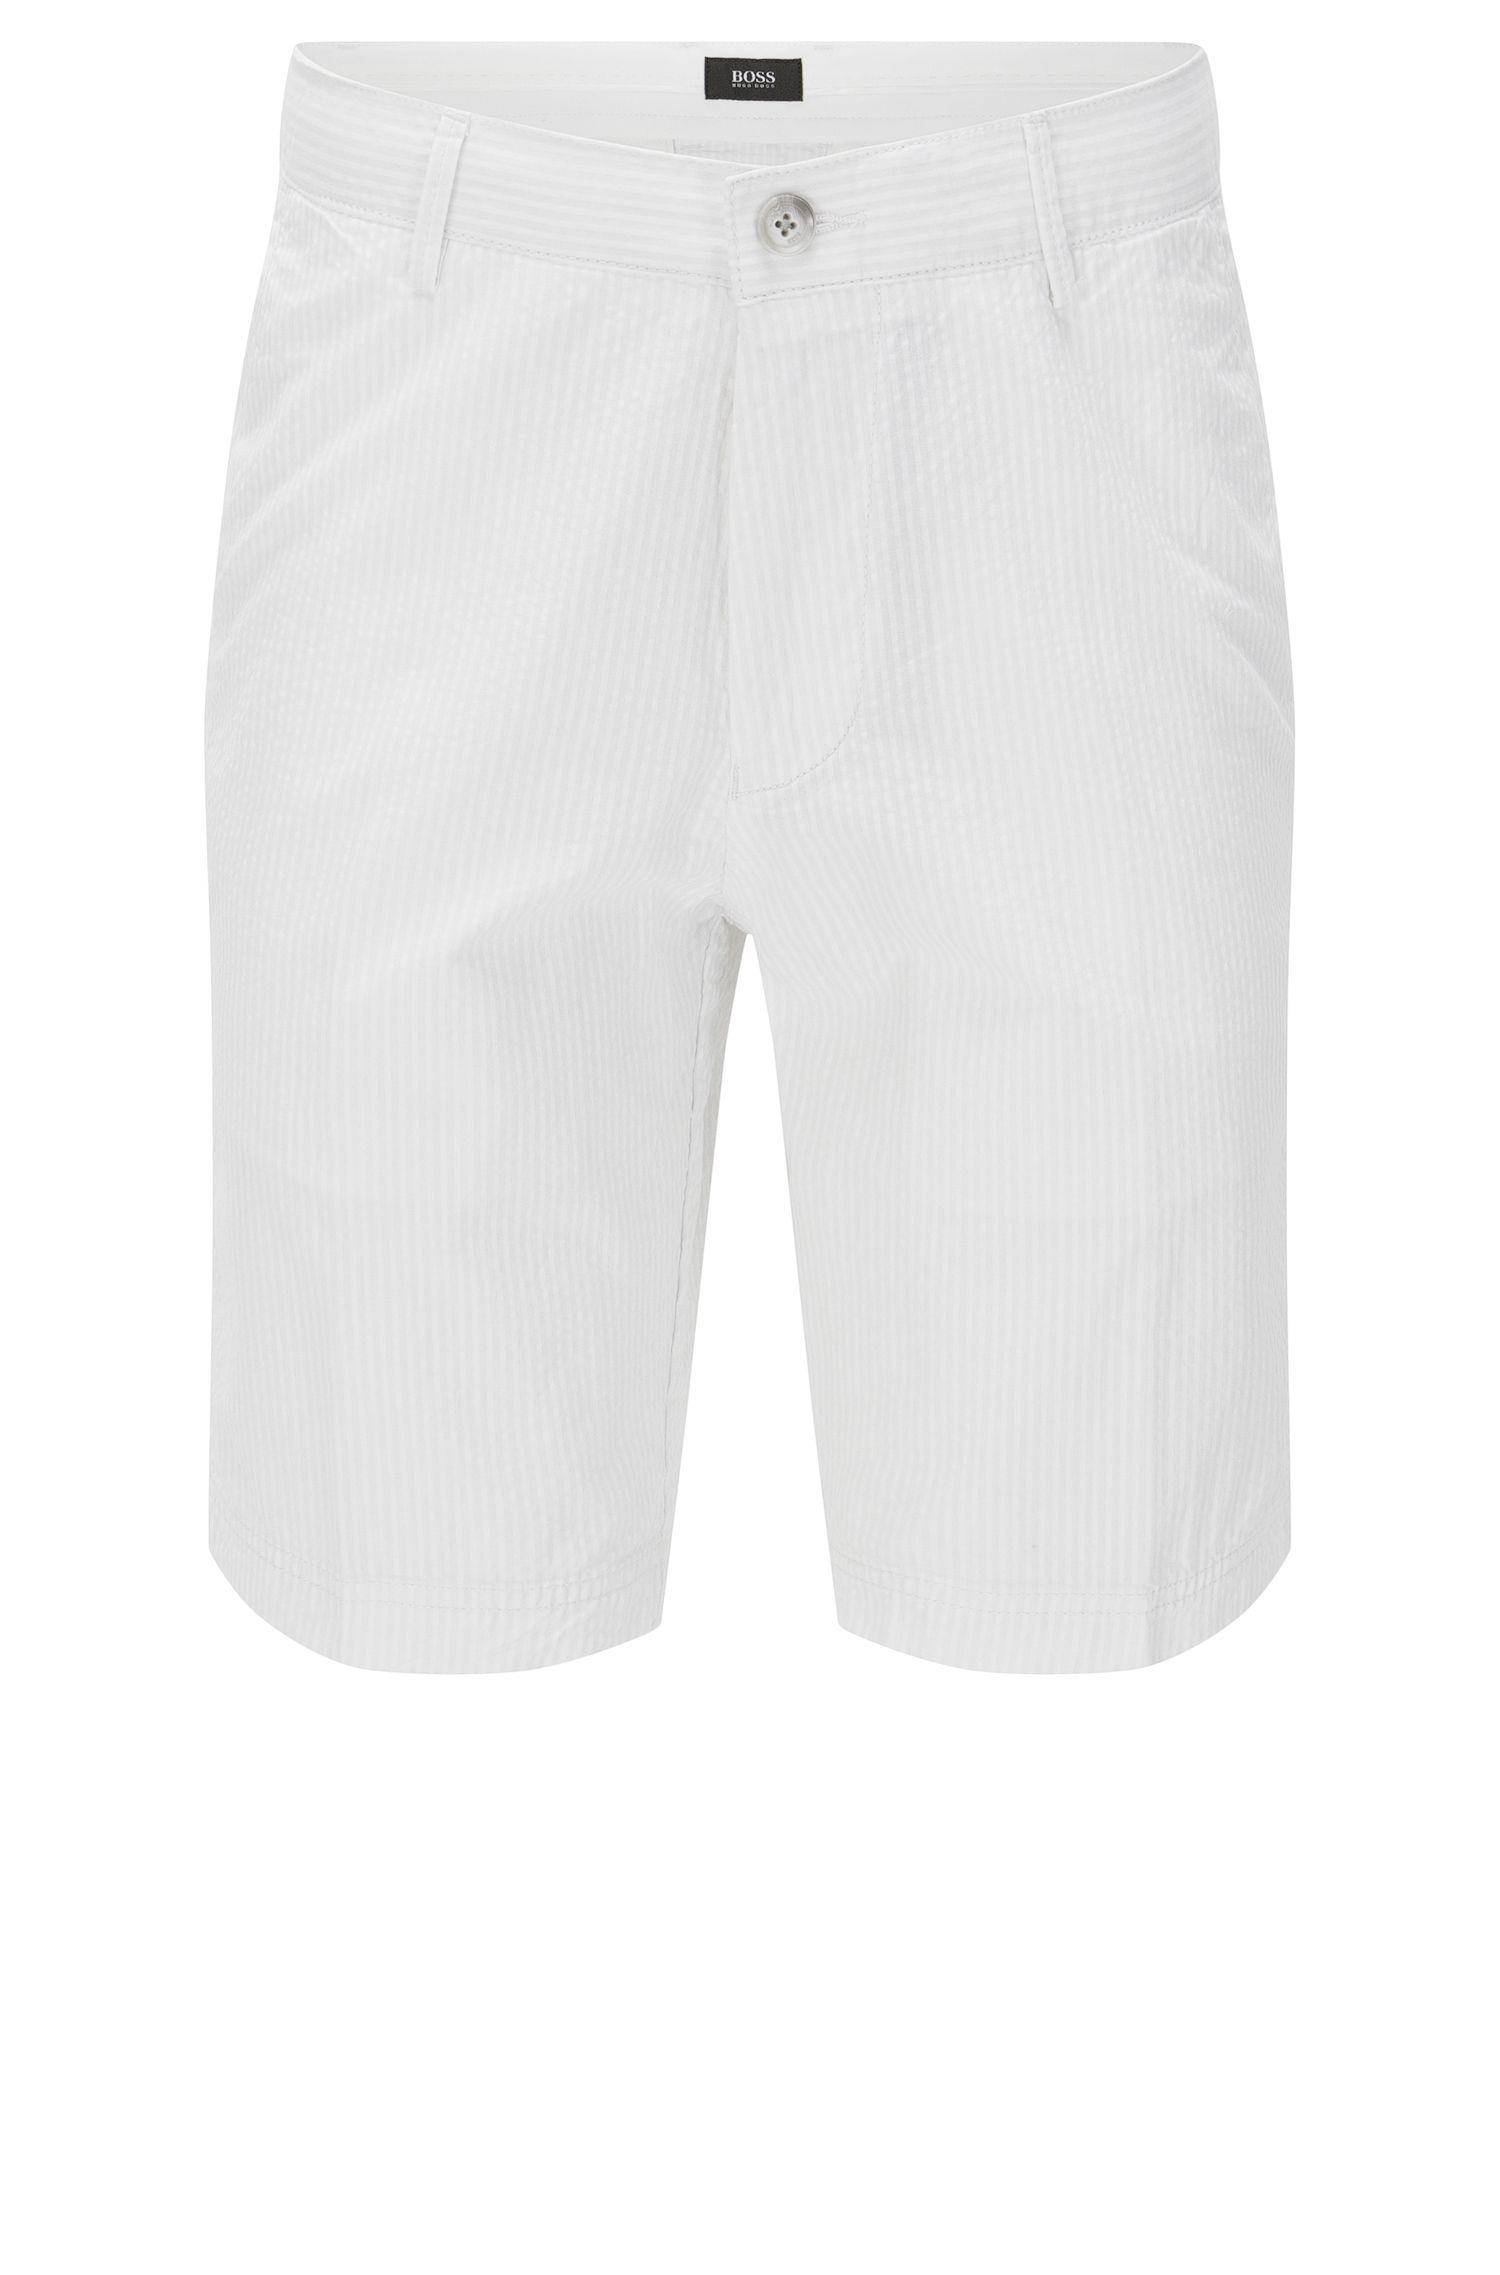 Cotton Tonal Seersucker Short, Regular Fit   Crigan Short W